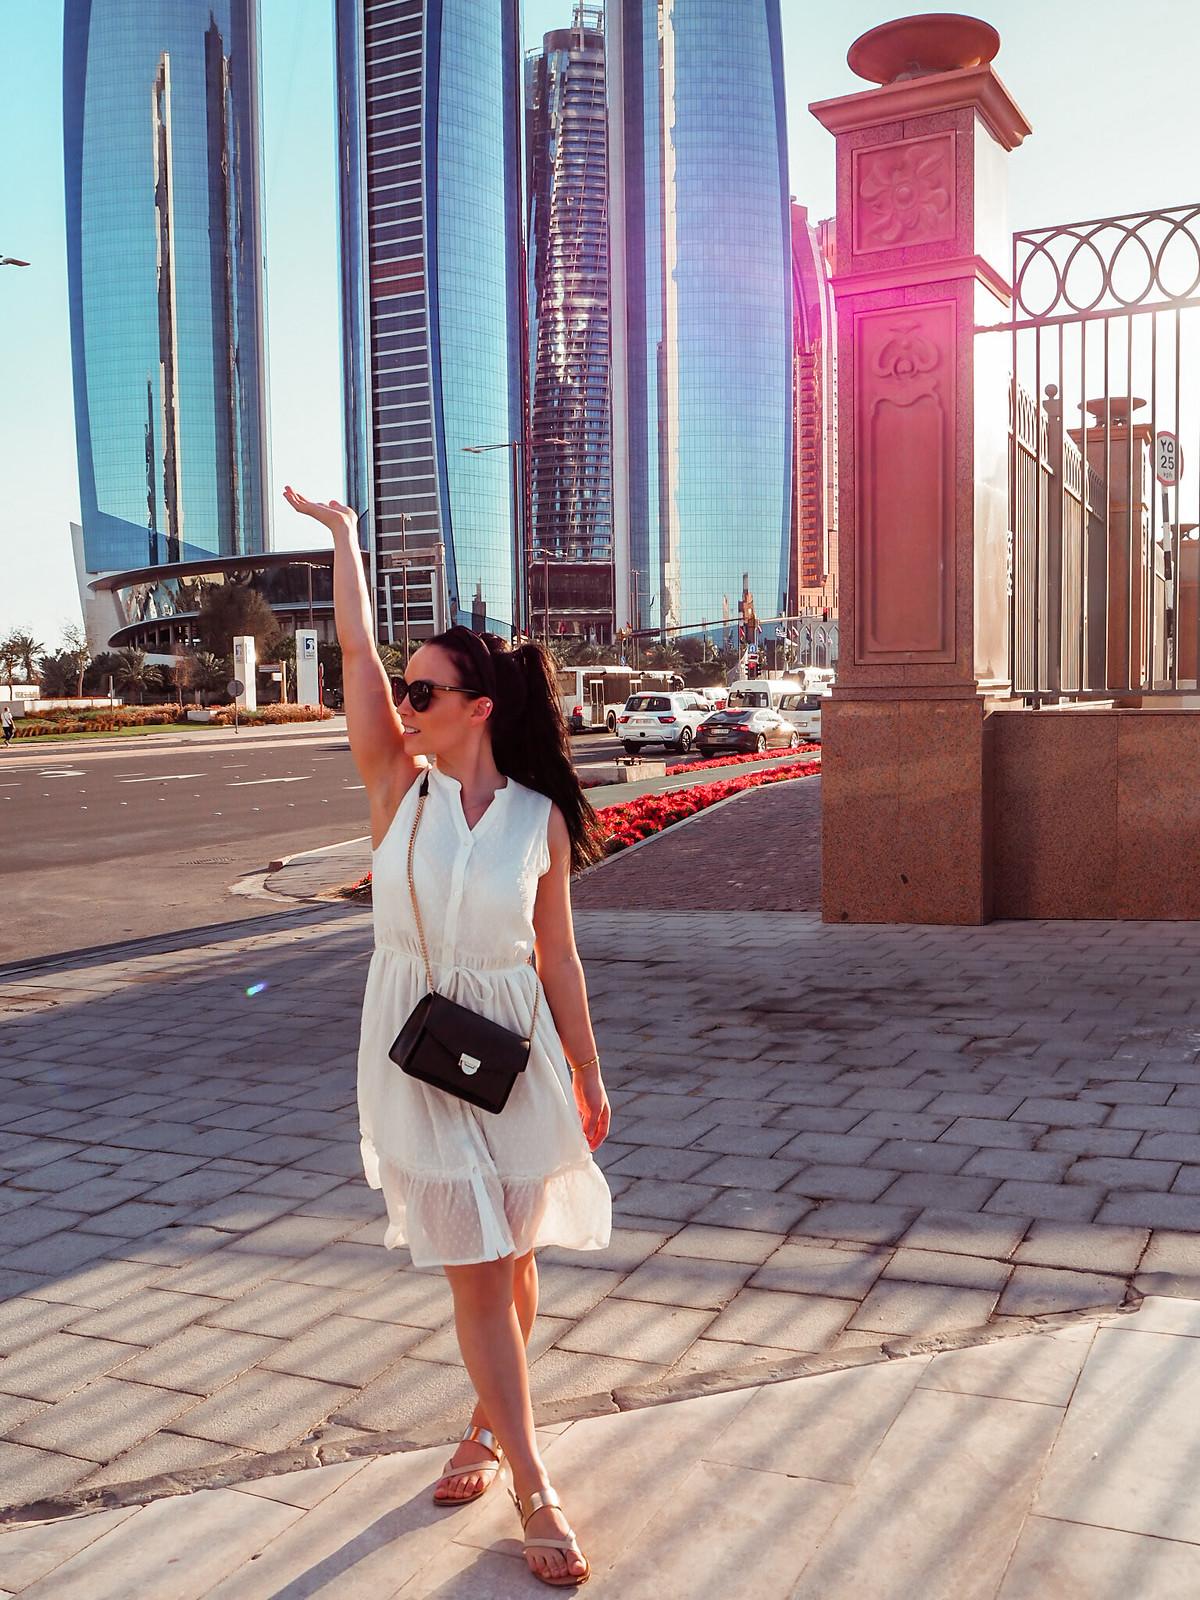 Corniche Street ja Etihad Towers